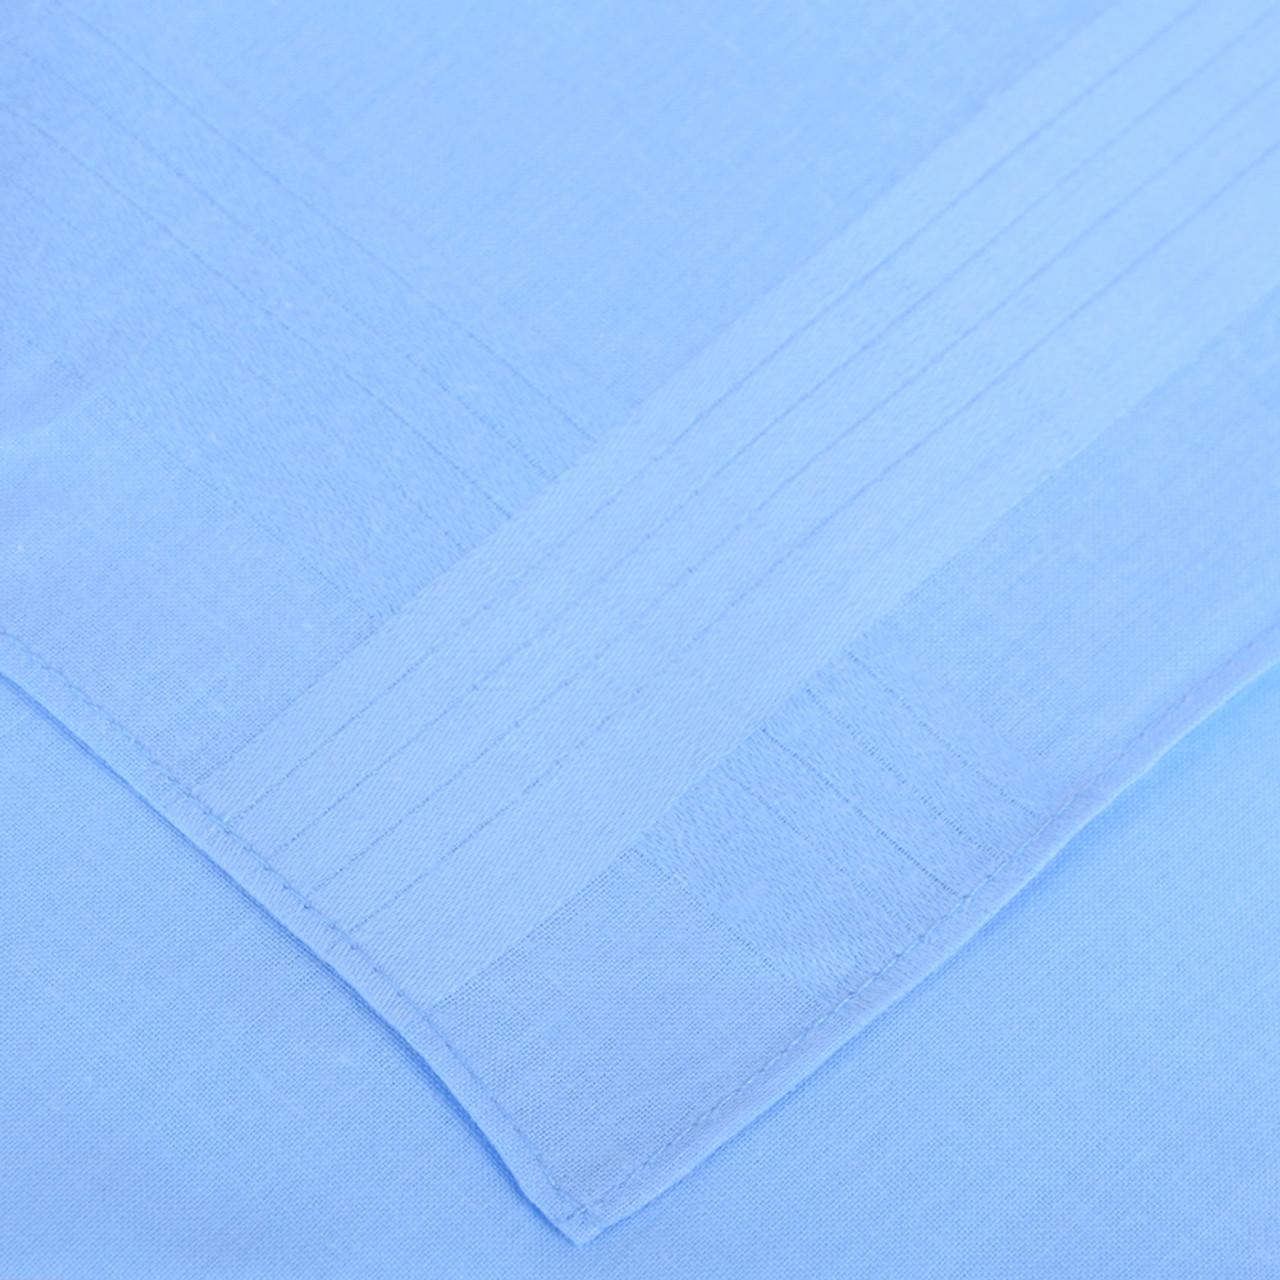 MSCB1563 Boxed Fancy Cotton Handkerchiefs Men/'s 3pc